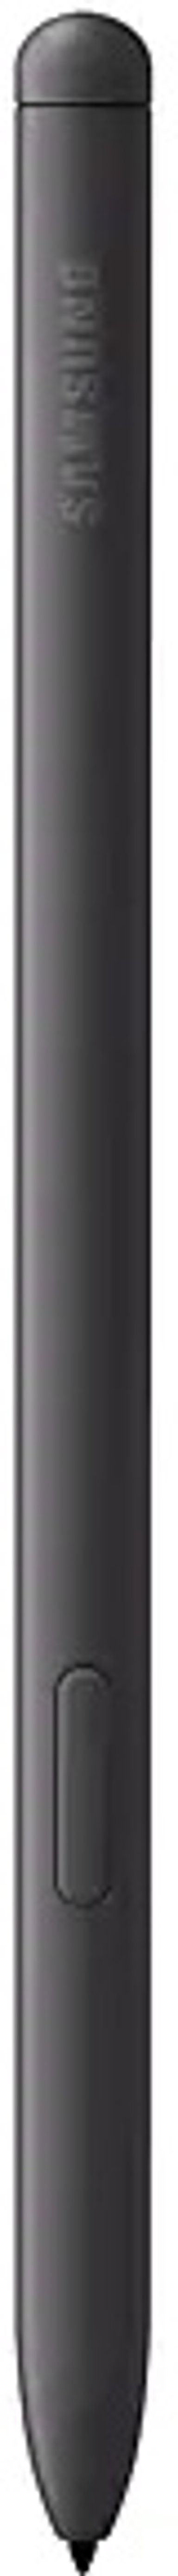 Samsung S Pen Galaxy TAB S6 lite